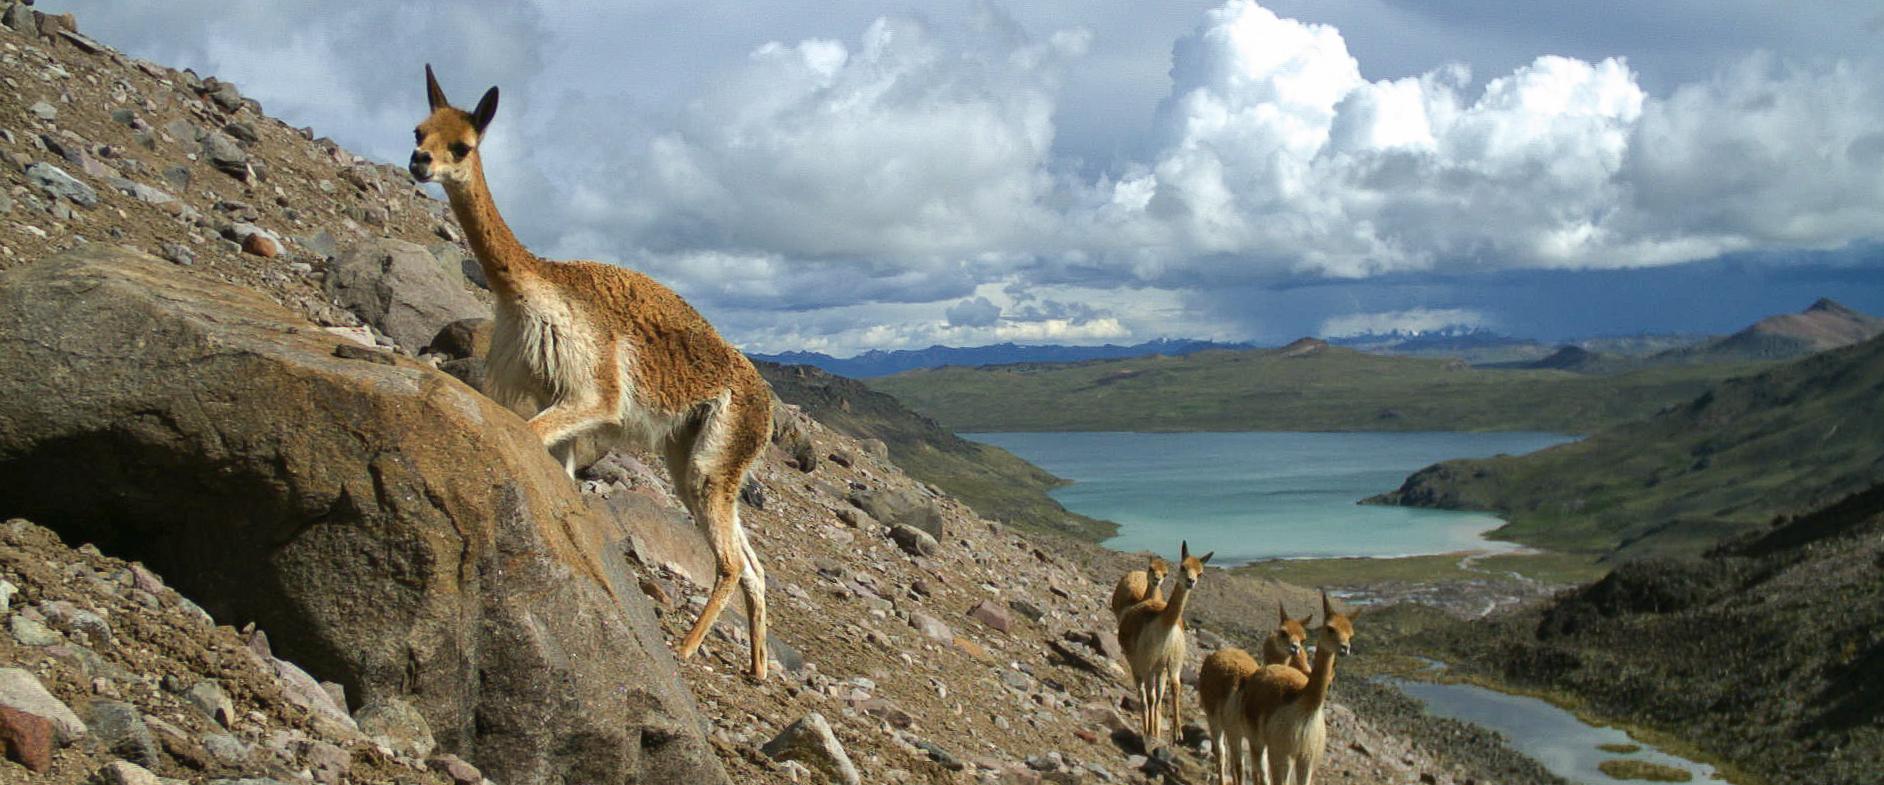 Diverse and Rare Mammals